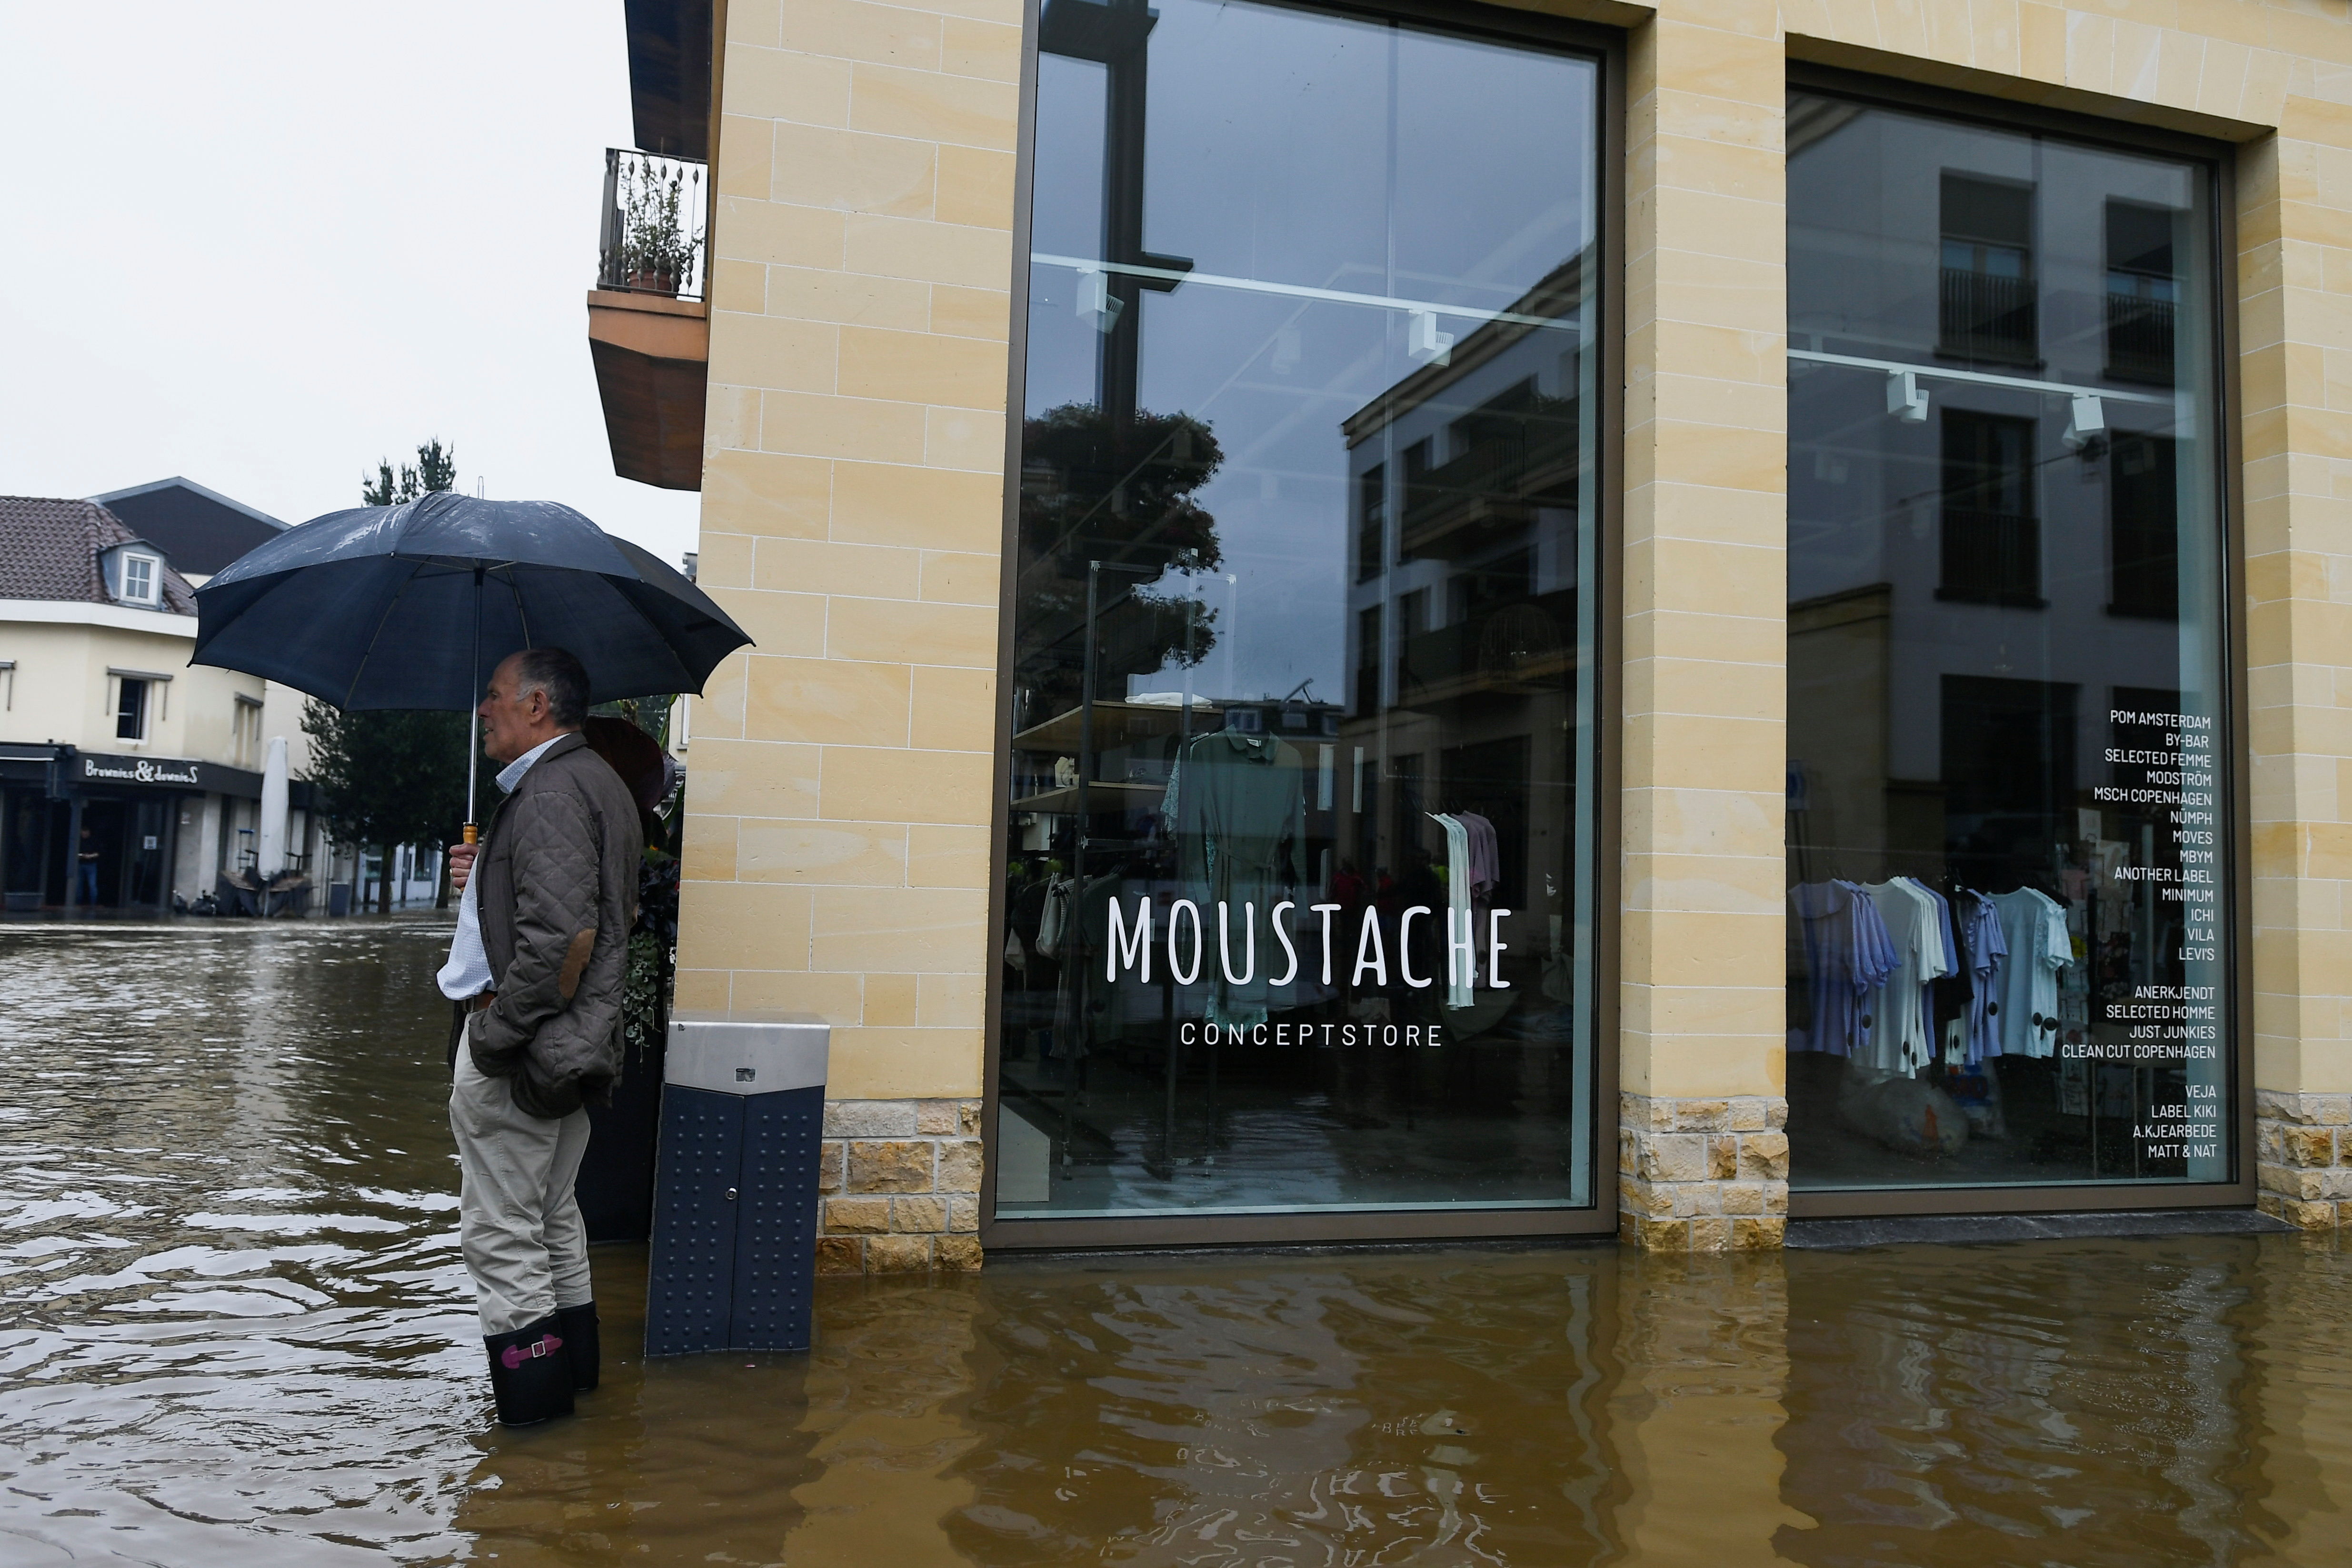 A man with an umbrella stands at a flooded street, following heavy rainfalls in Valkenburg, Netherlands, July 15, 2021. REUTERS/Piroschka Van De Wouw